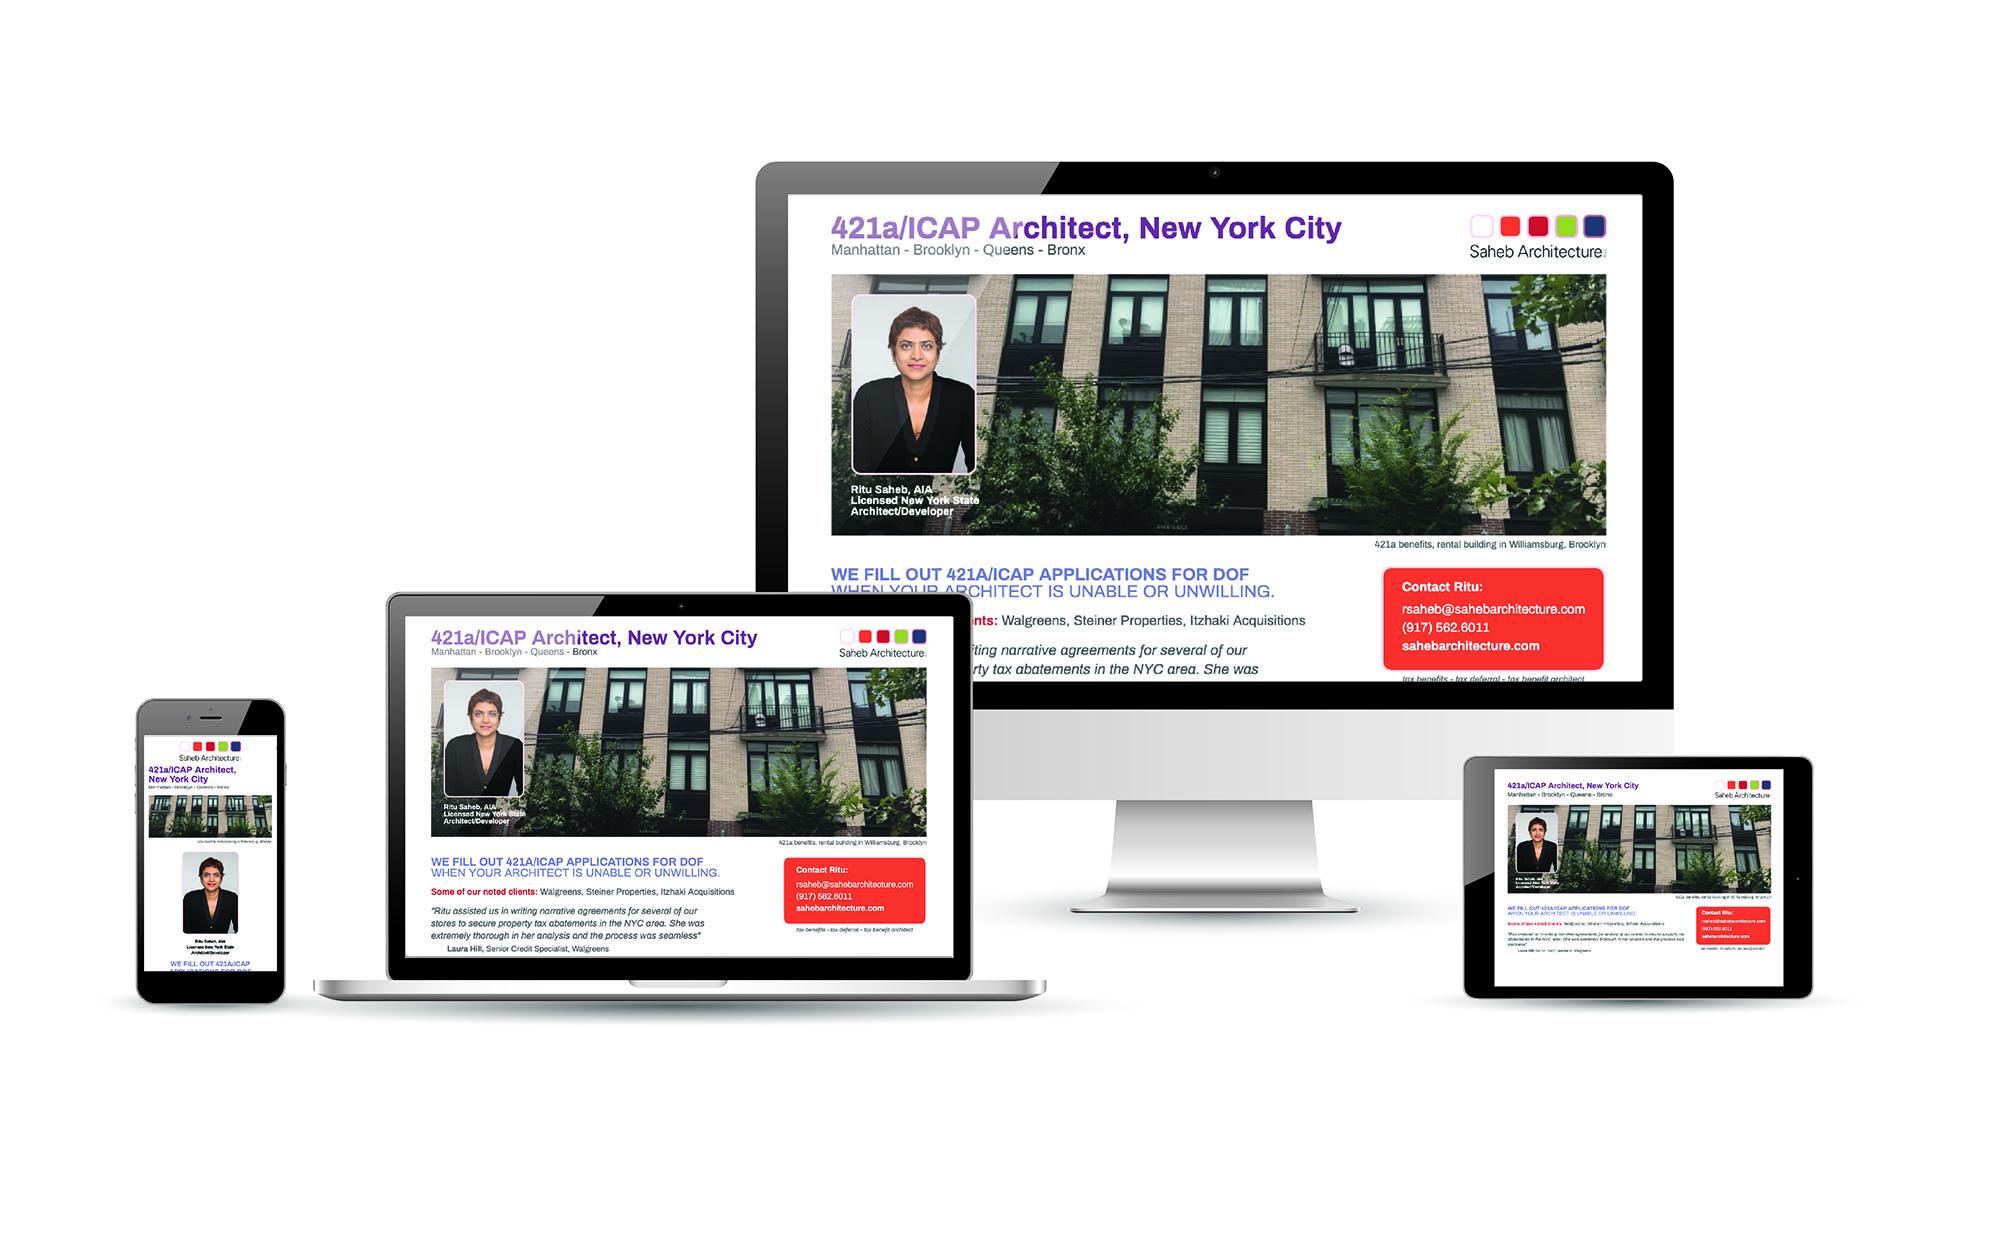 architect website, landing page design, new york city